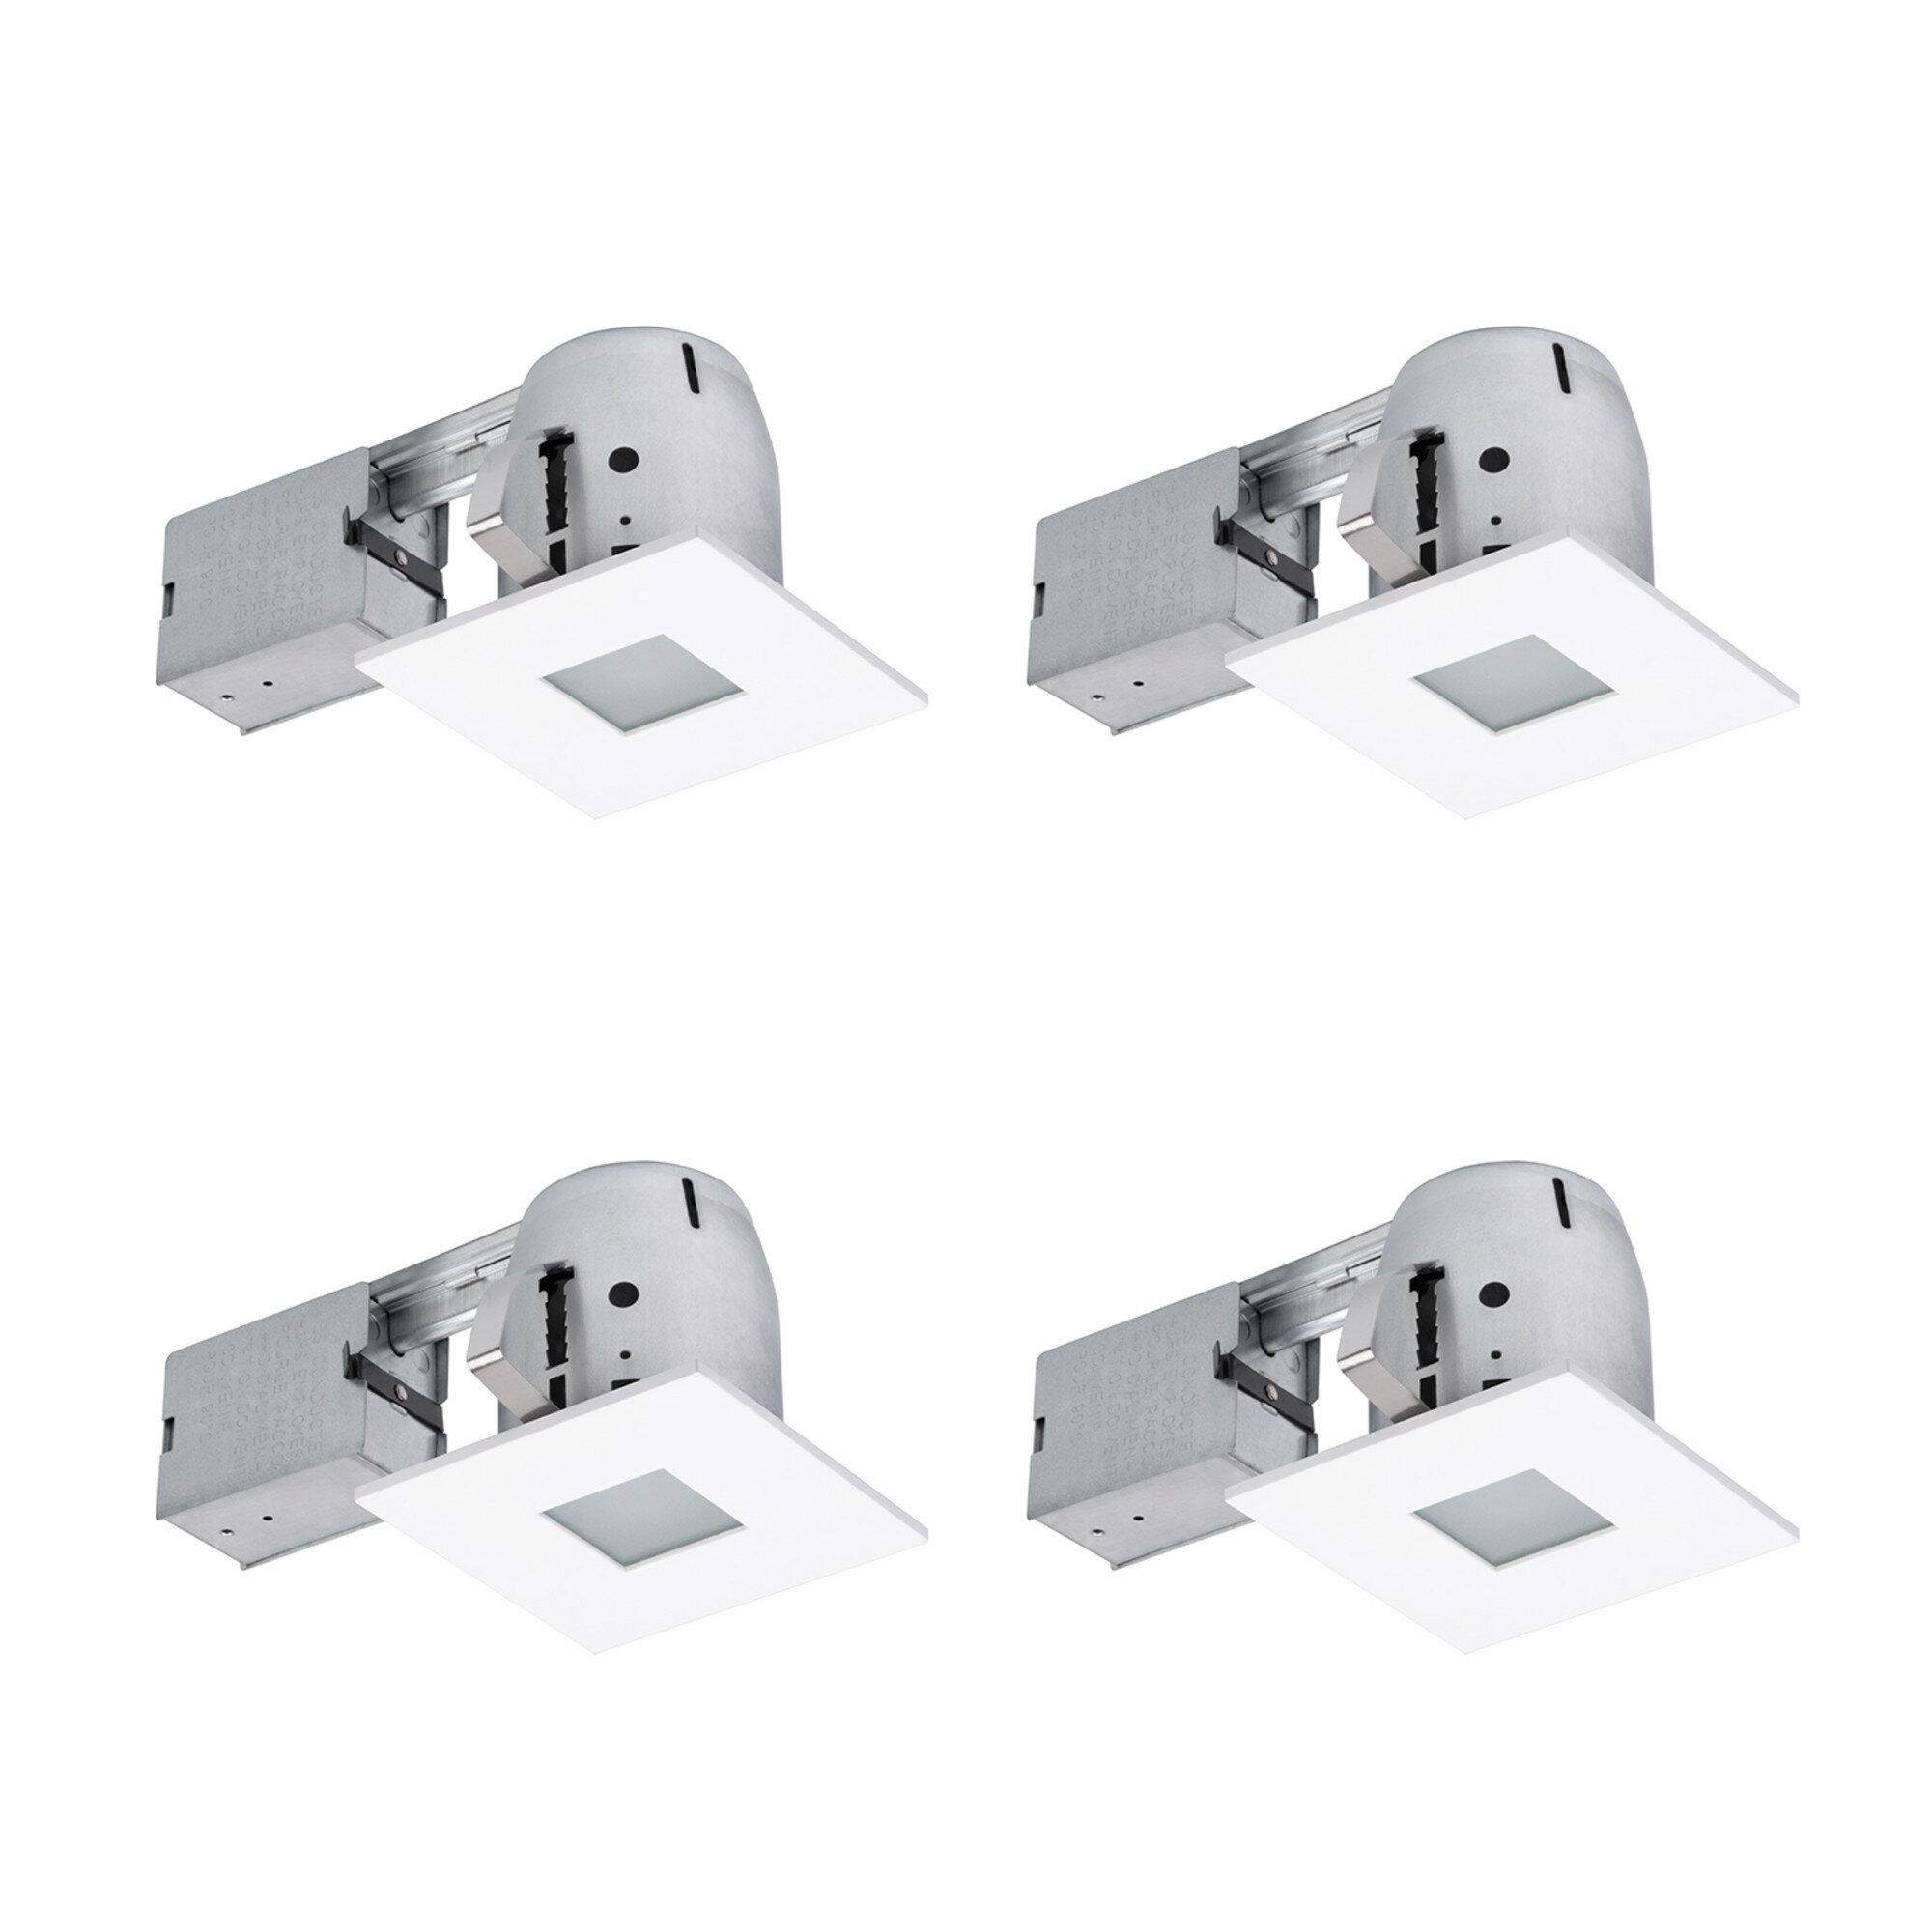 Ryanne Bathroom Square 4 Recessed Lighting Kit